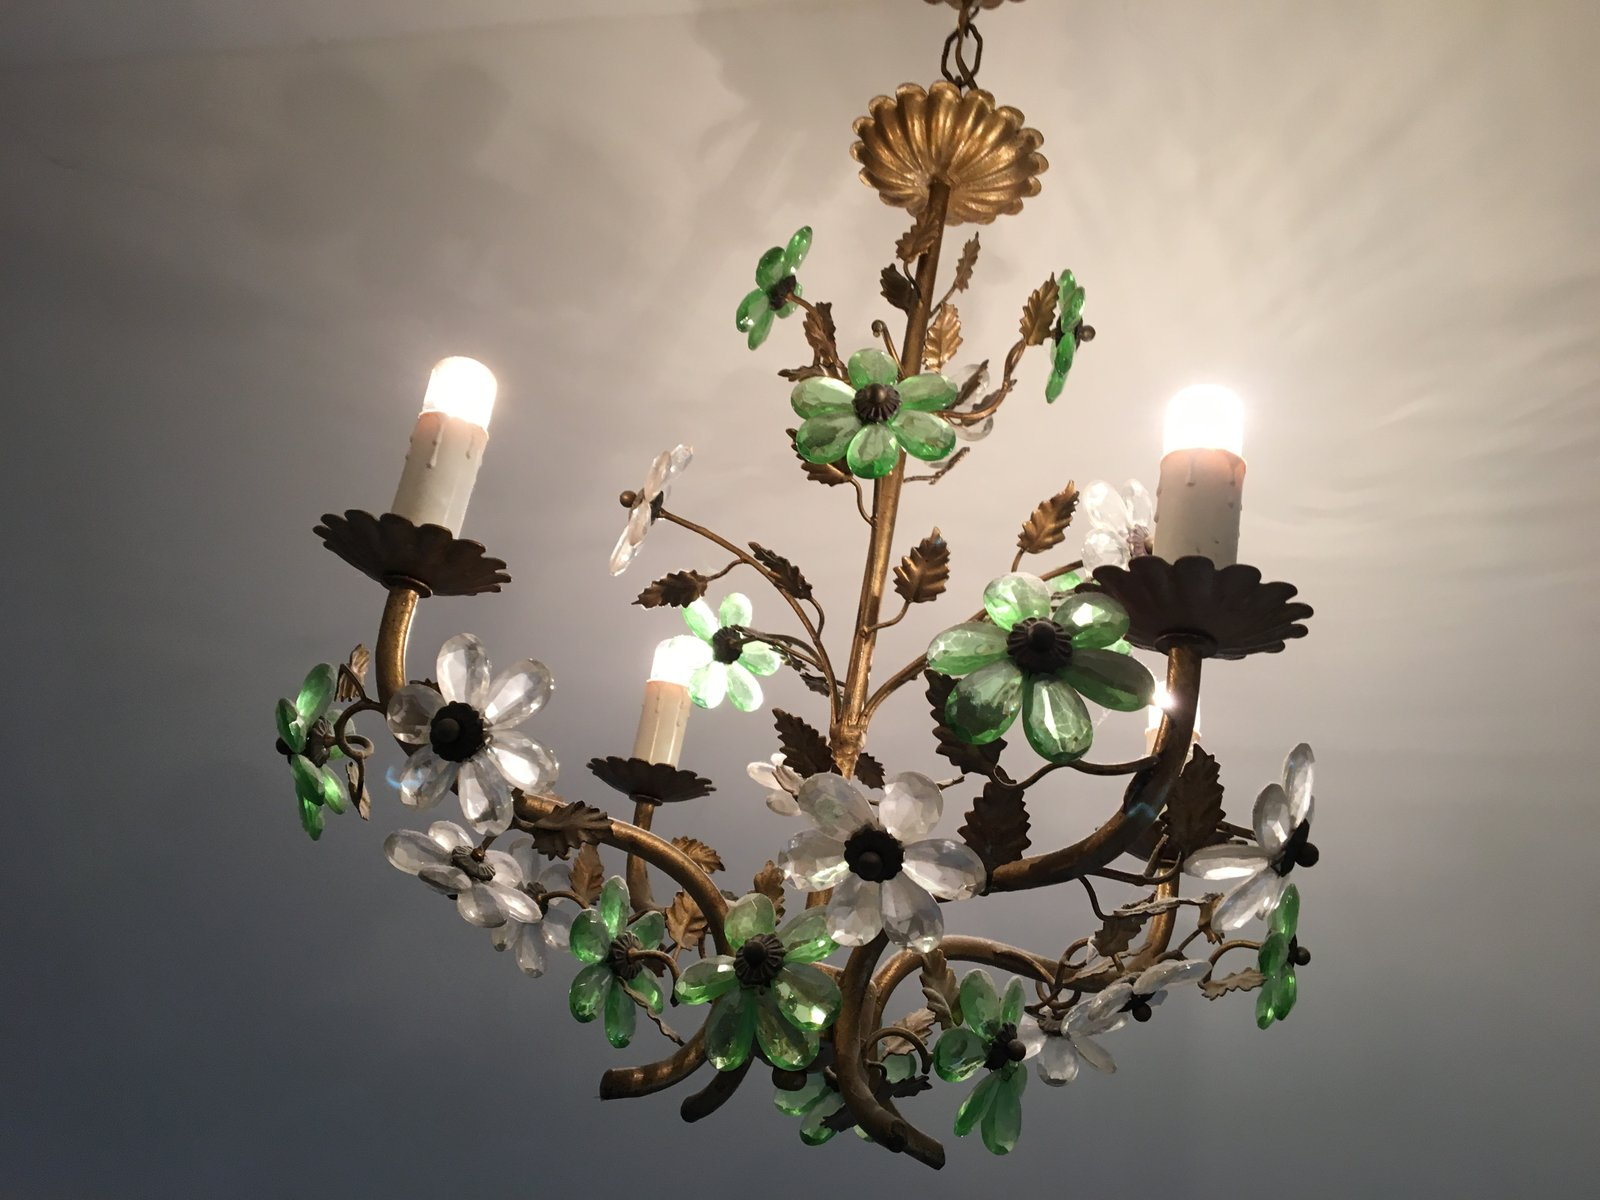 shape crystal with antique brass french chandeliers solid f lights lighting cut outside pendant id light twelve framed furniture chandelier l bulb bell